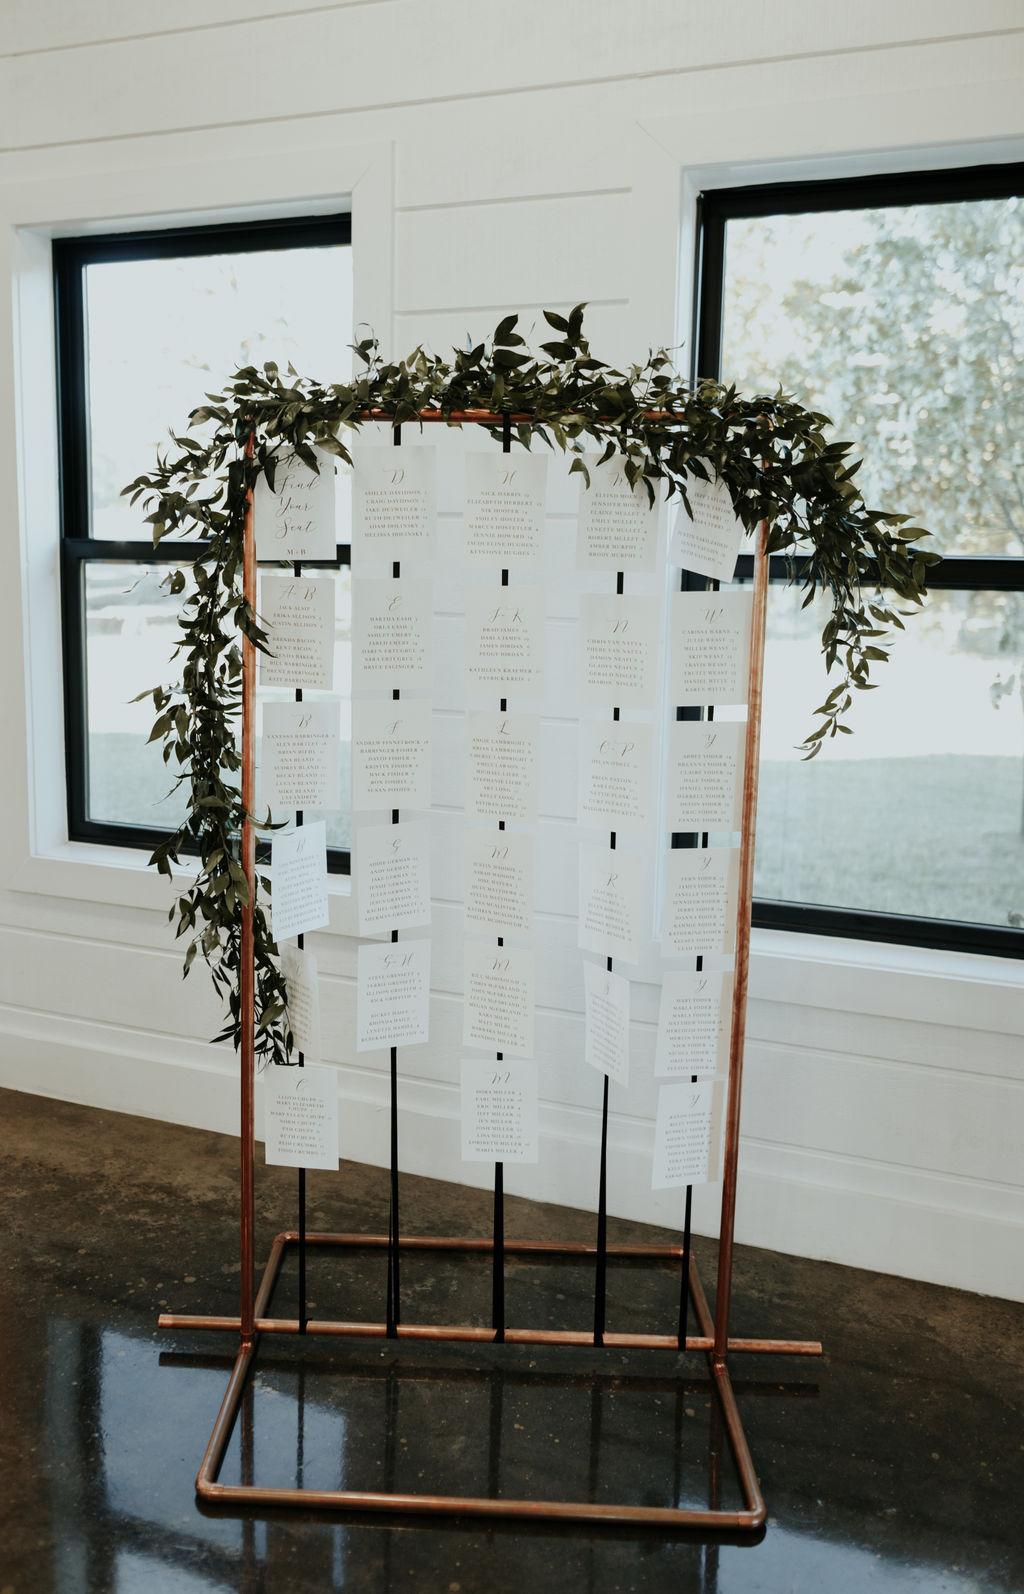 Best Oklahoma Outdoor Wedding Venue Tulsa Bixby White Barn 42.jpg